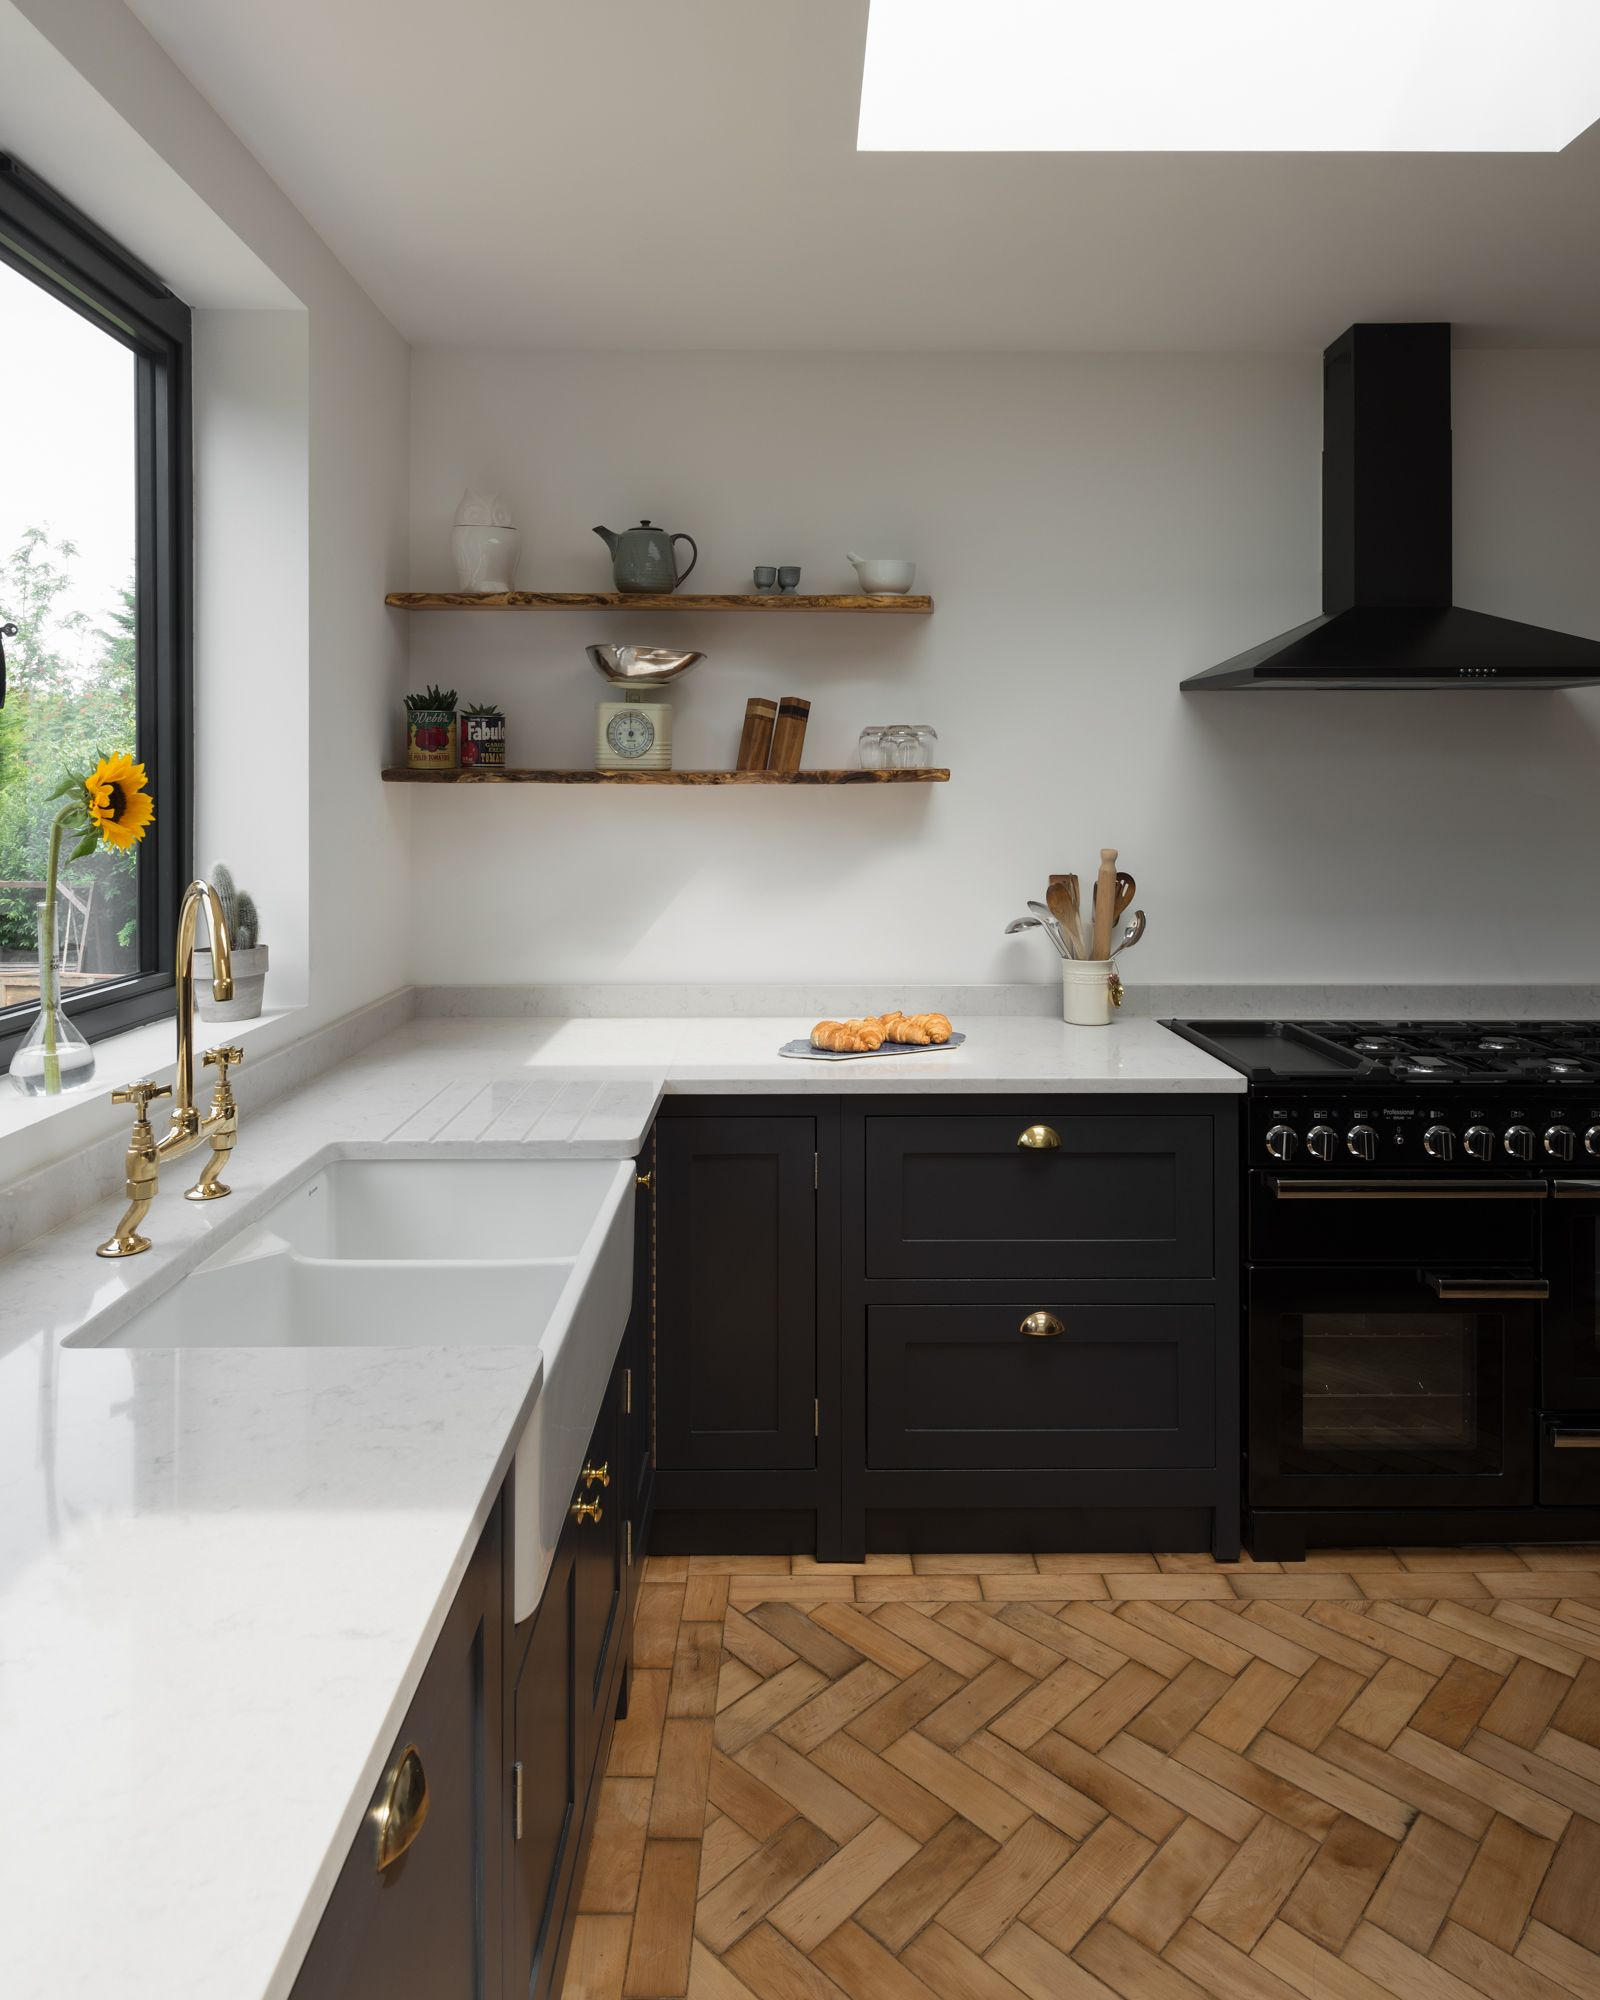 Shaker Style Kitchen Ideas: Pin By The Shaker Workshop Ltd On Chislehurst Shaker